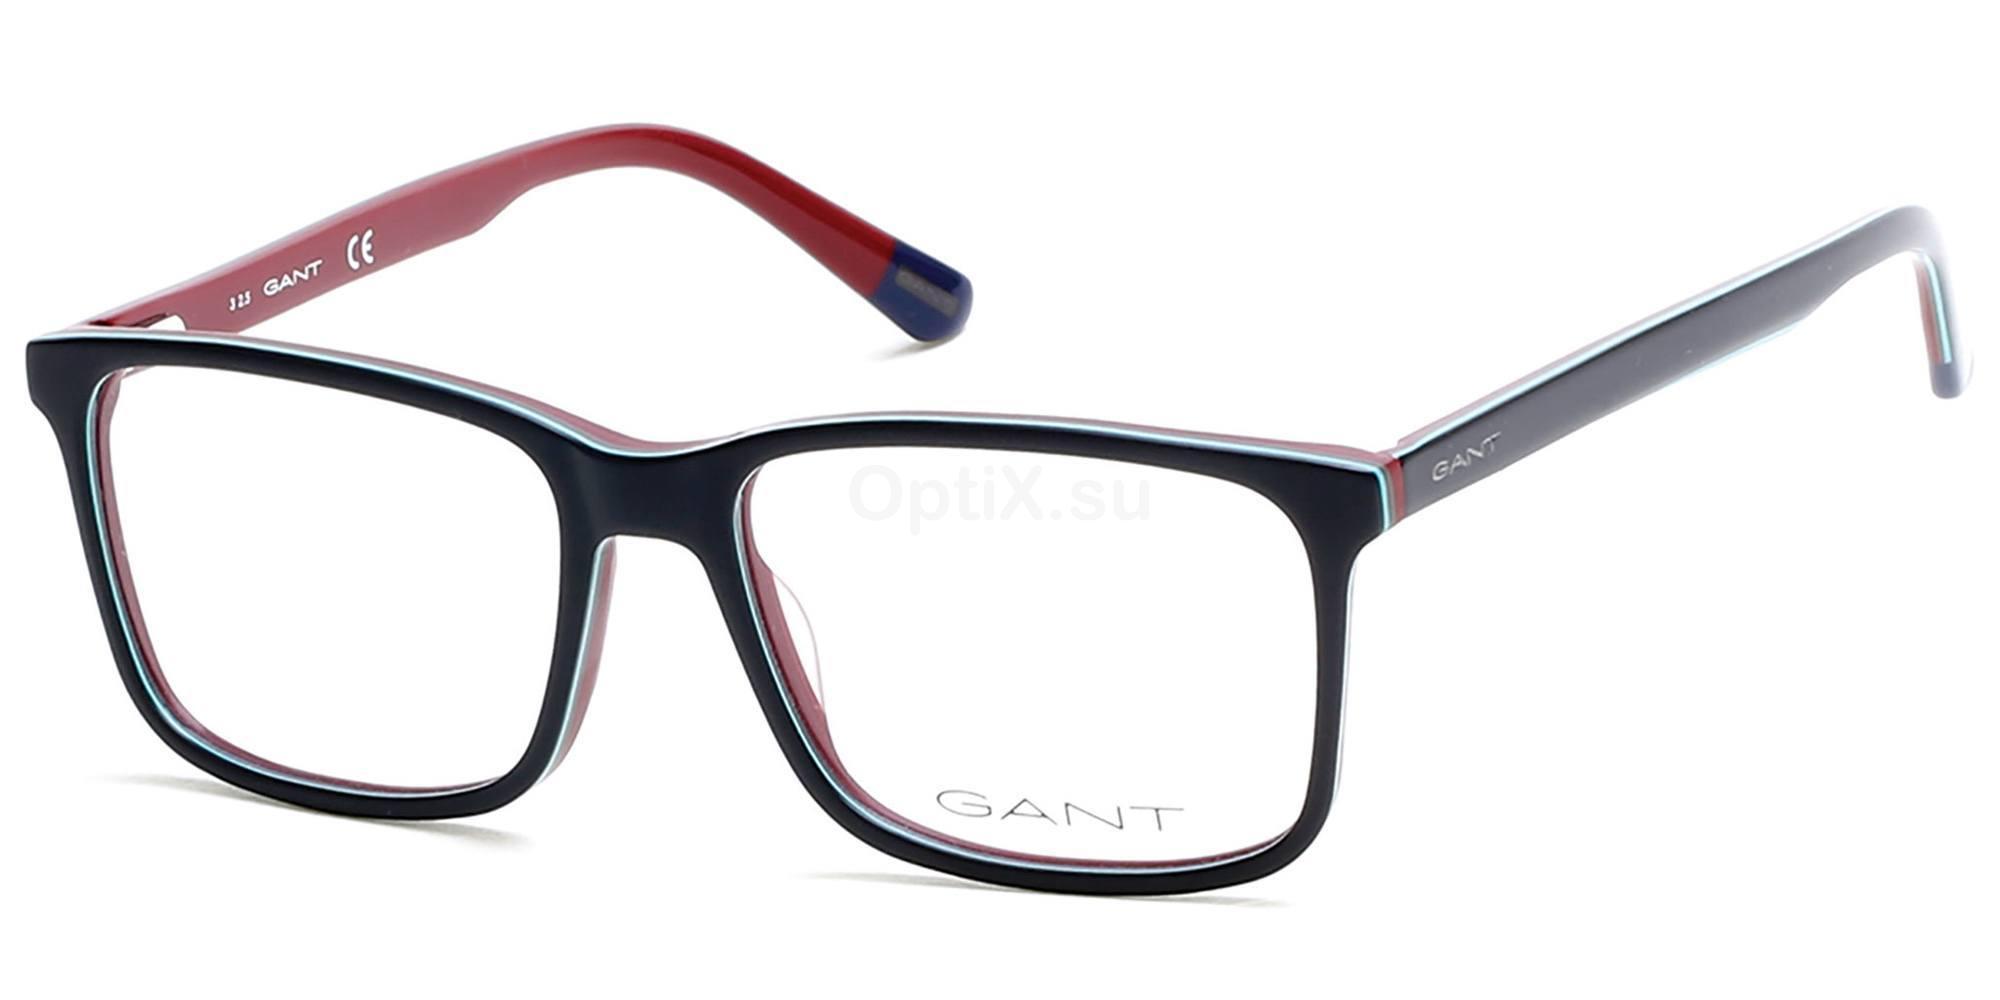 020 GA3110 , Gant